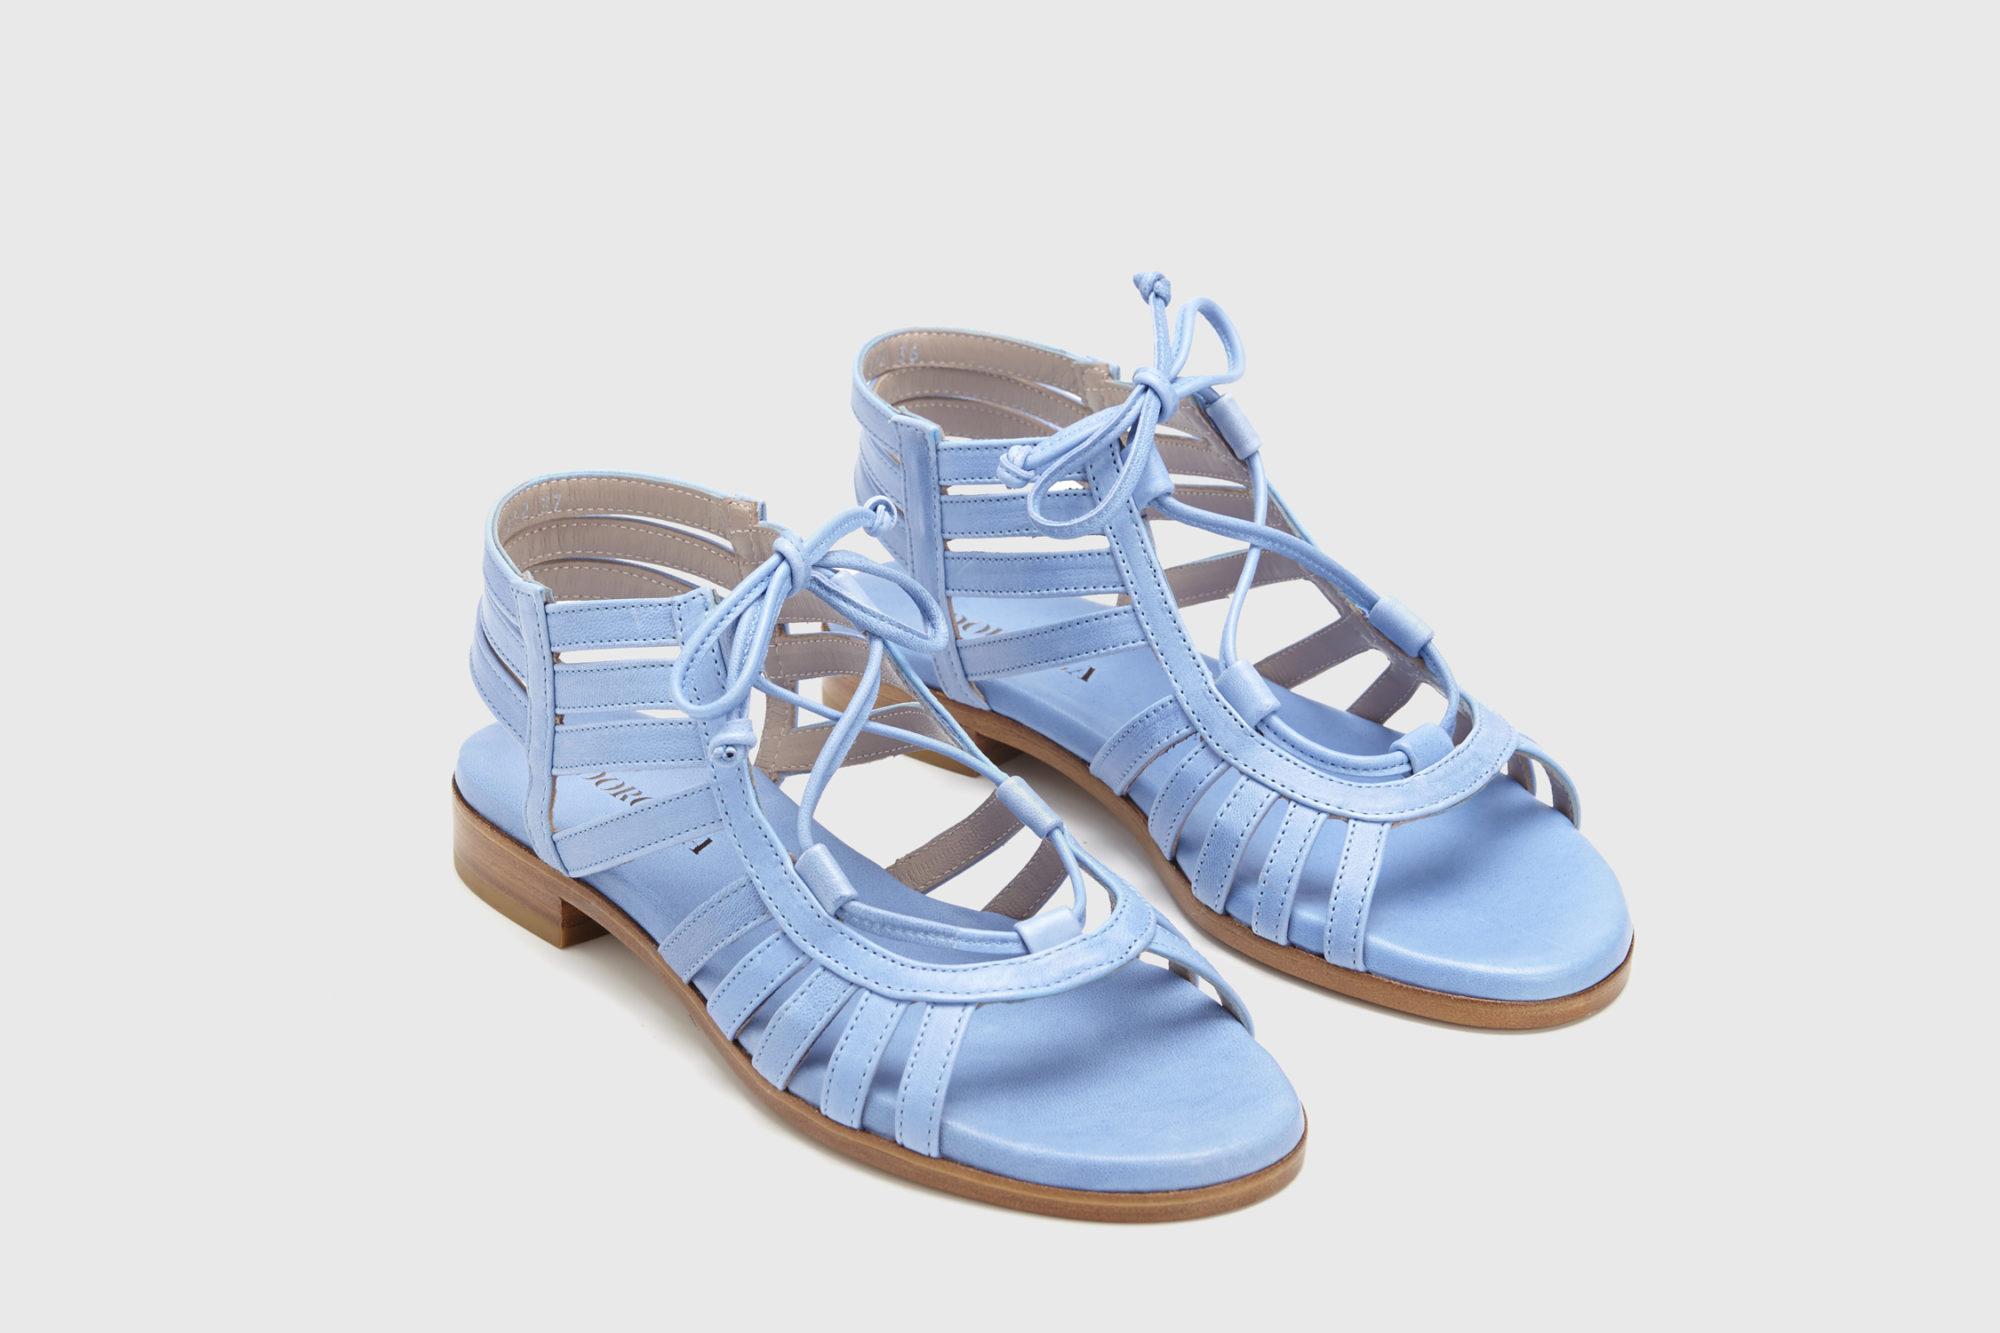 Dorotea sandalia plana Margot azul ss17